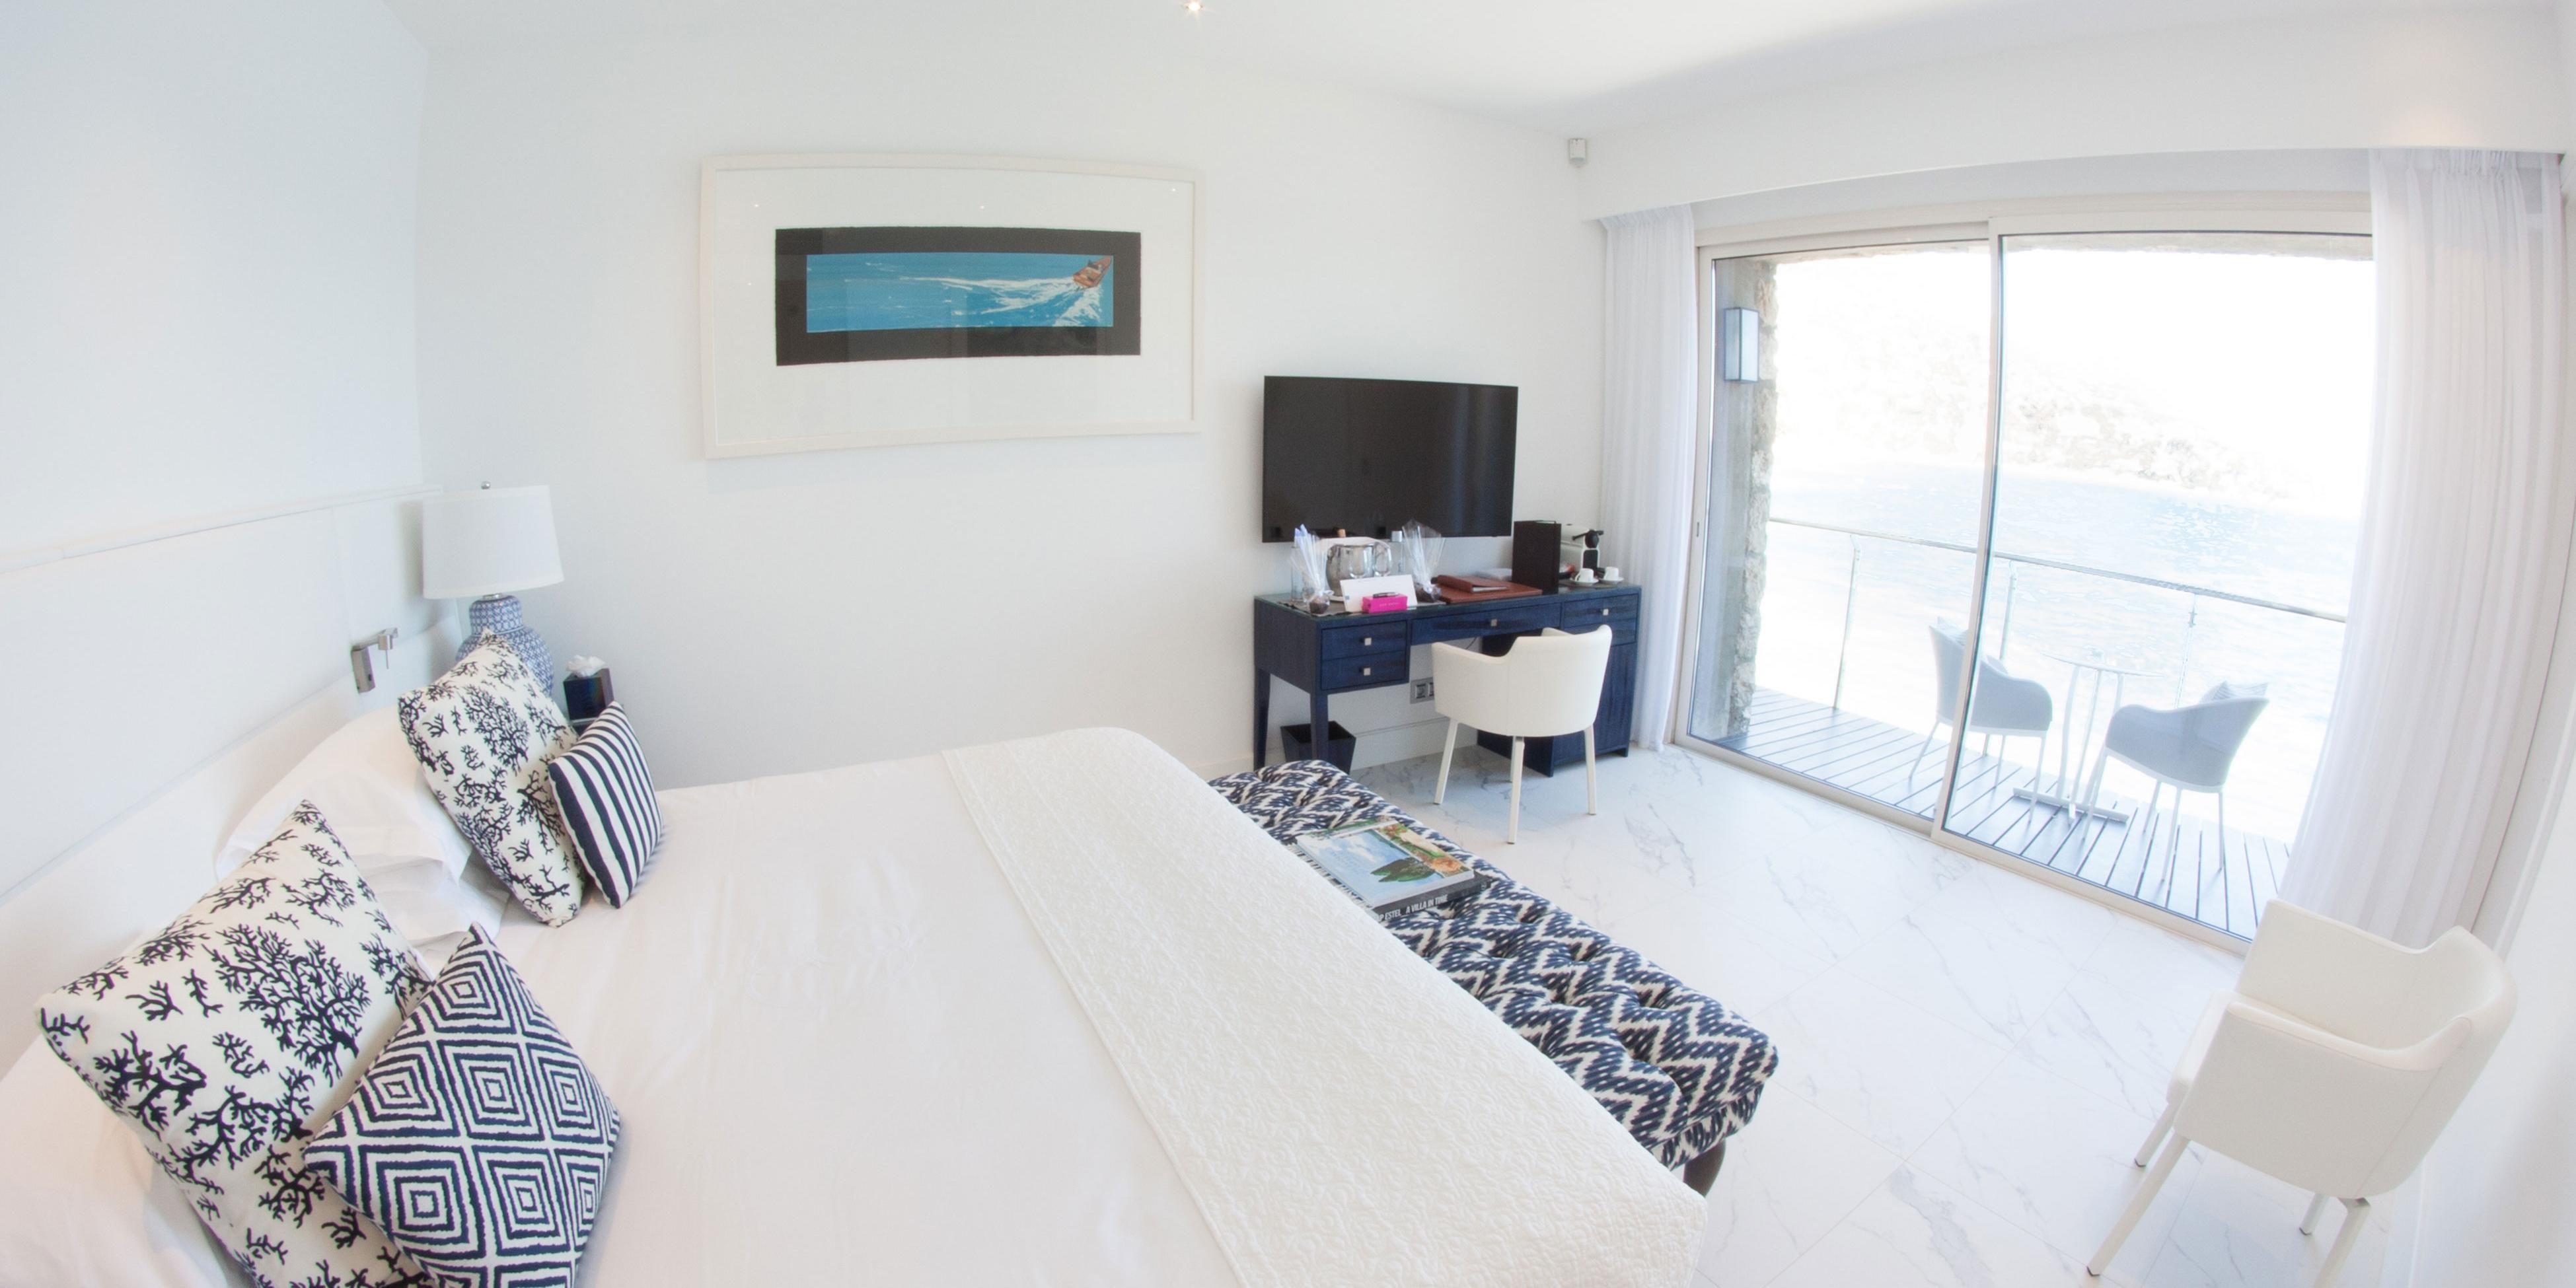 Deluxe Room with Balcony 'La Mer'